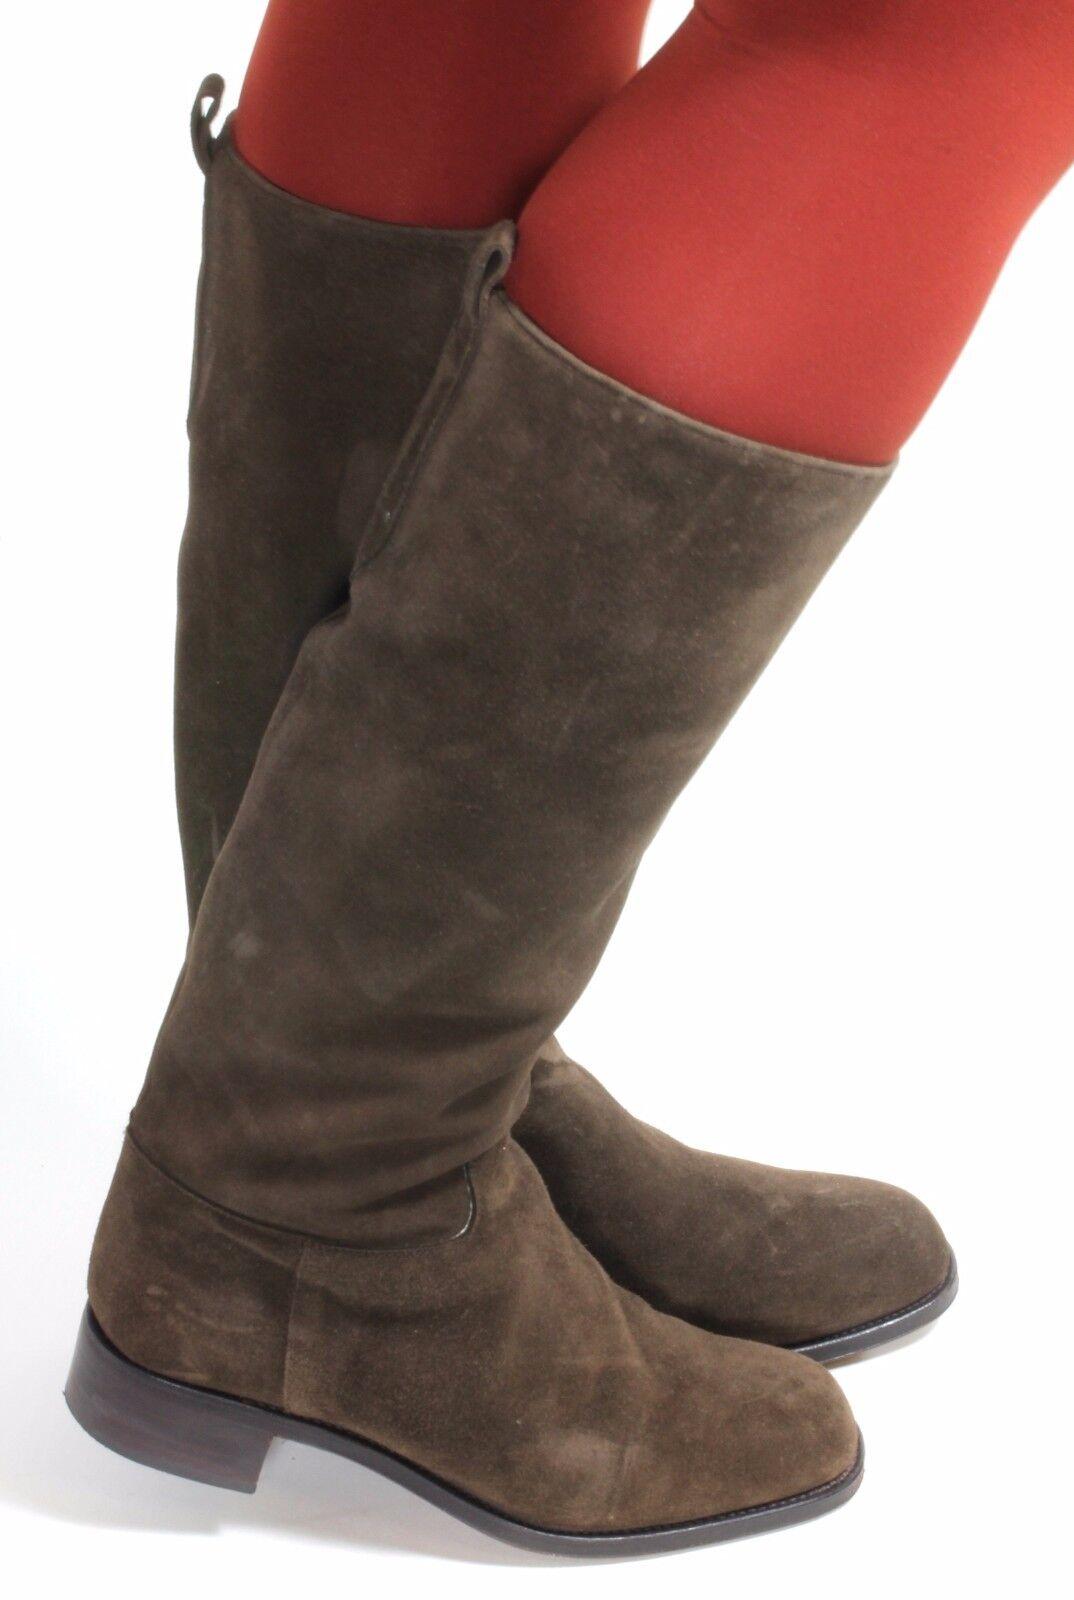 Damenstiefel Vintage Stiefel Leder Blogger Reiter Military Carmina Stiefel Edel 37